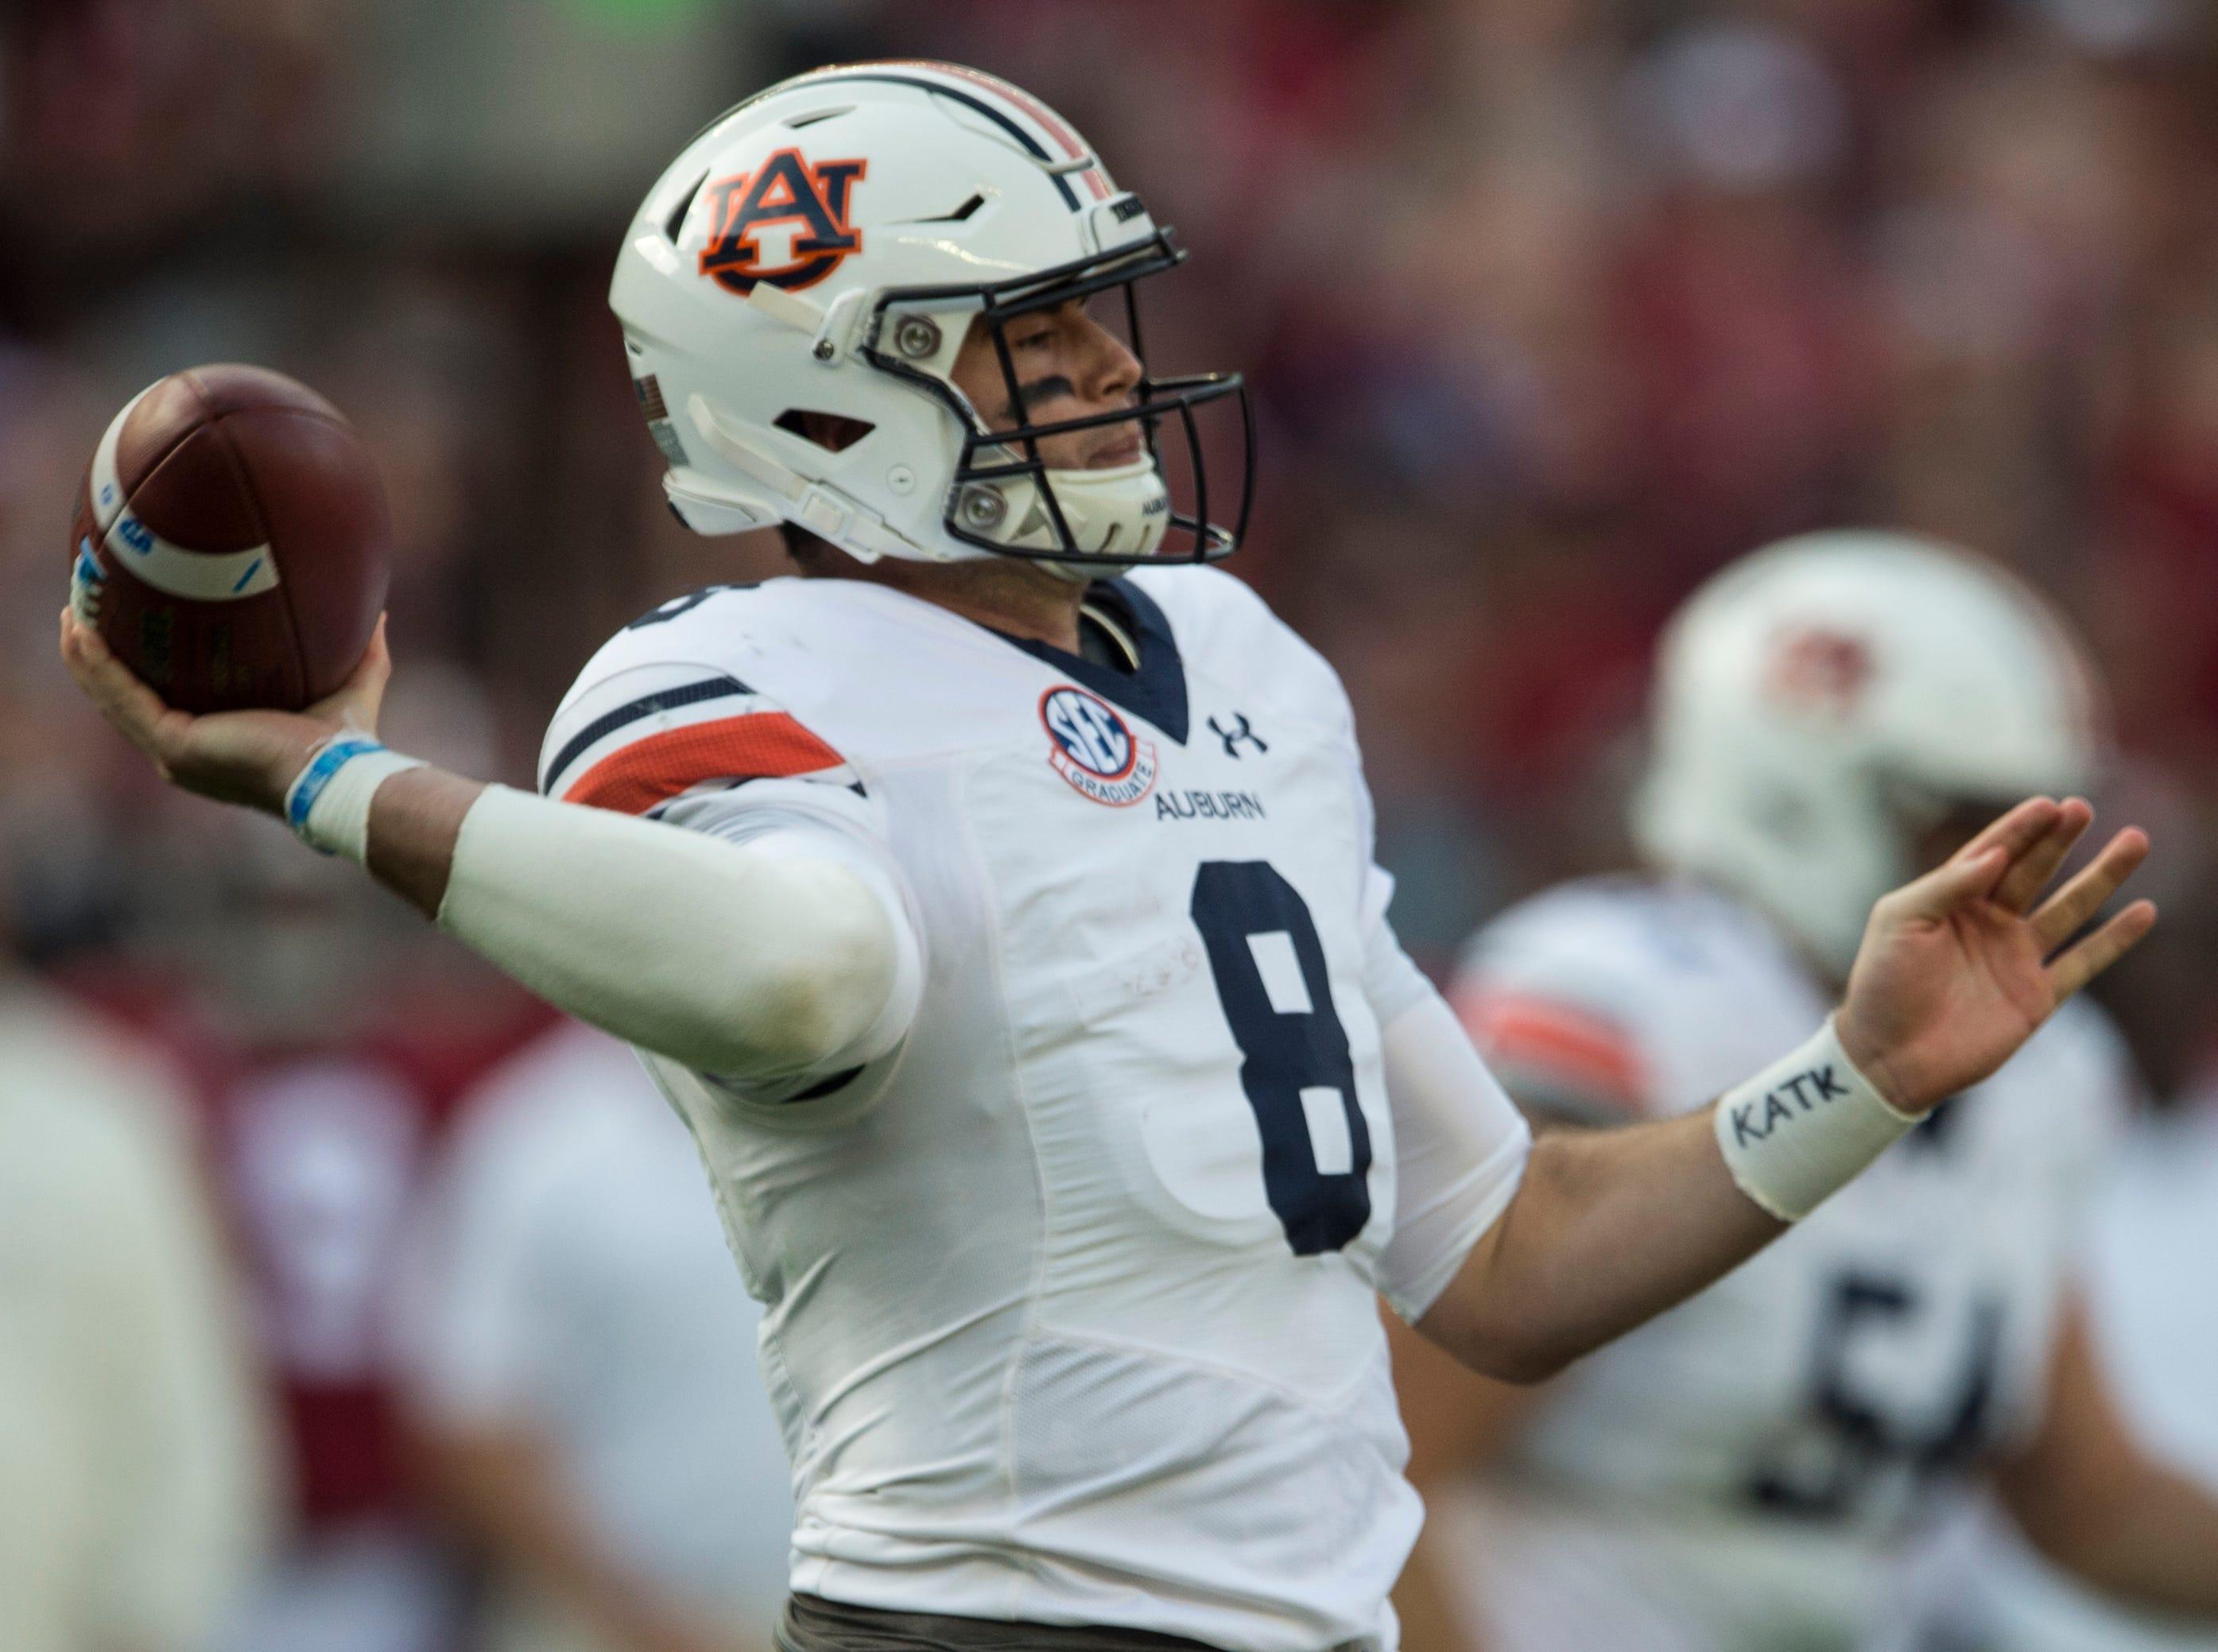 Auburn quarterback Jarrett Stidham (8) throws the ball down field during the Iron Bowl at Bryant-Denny Stadium in Tuscaloosa, Ala., on Saturday, Nov. 24, 2018. Alabama leads Auburn 17-14 at halftime.